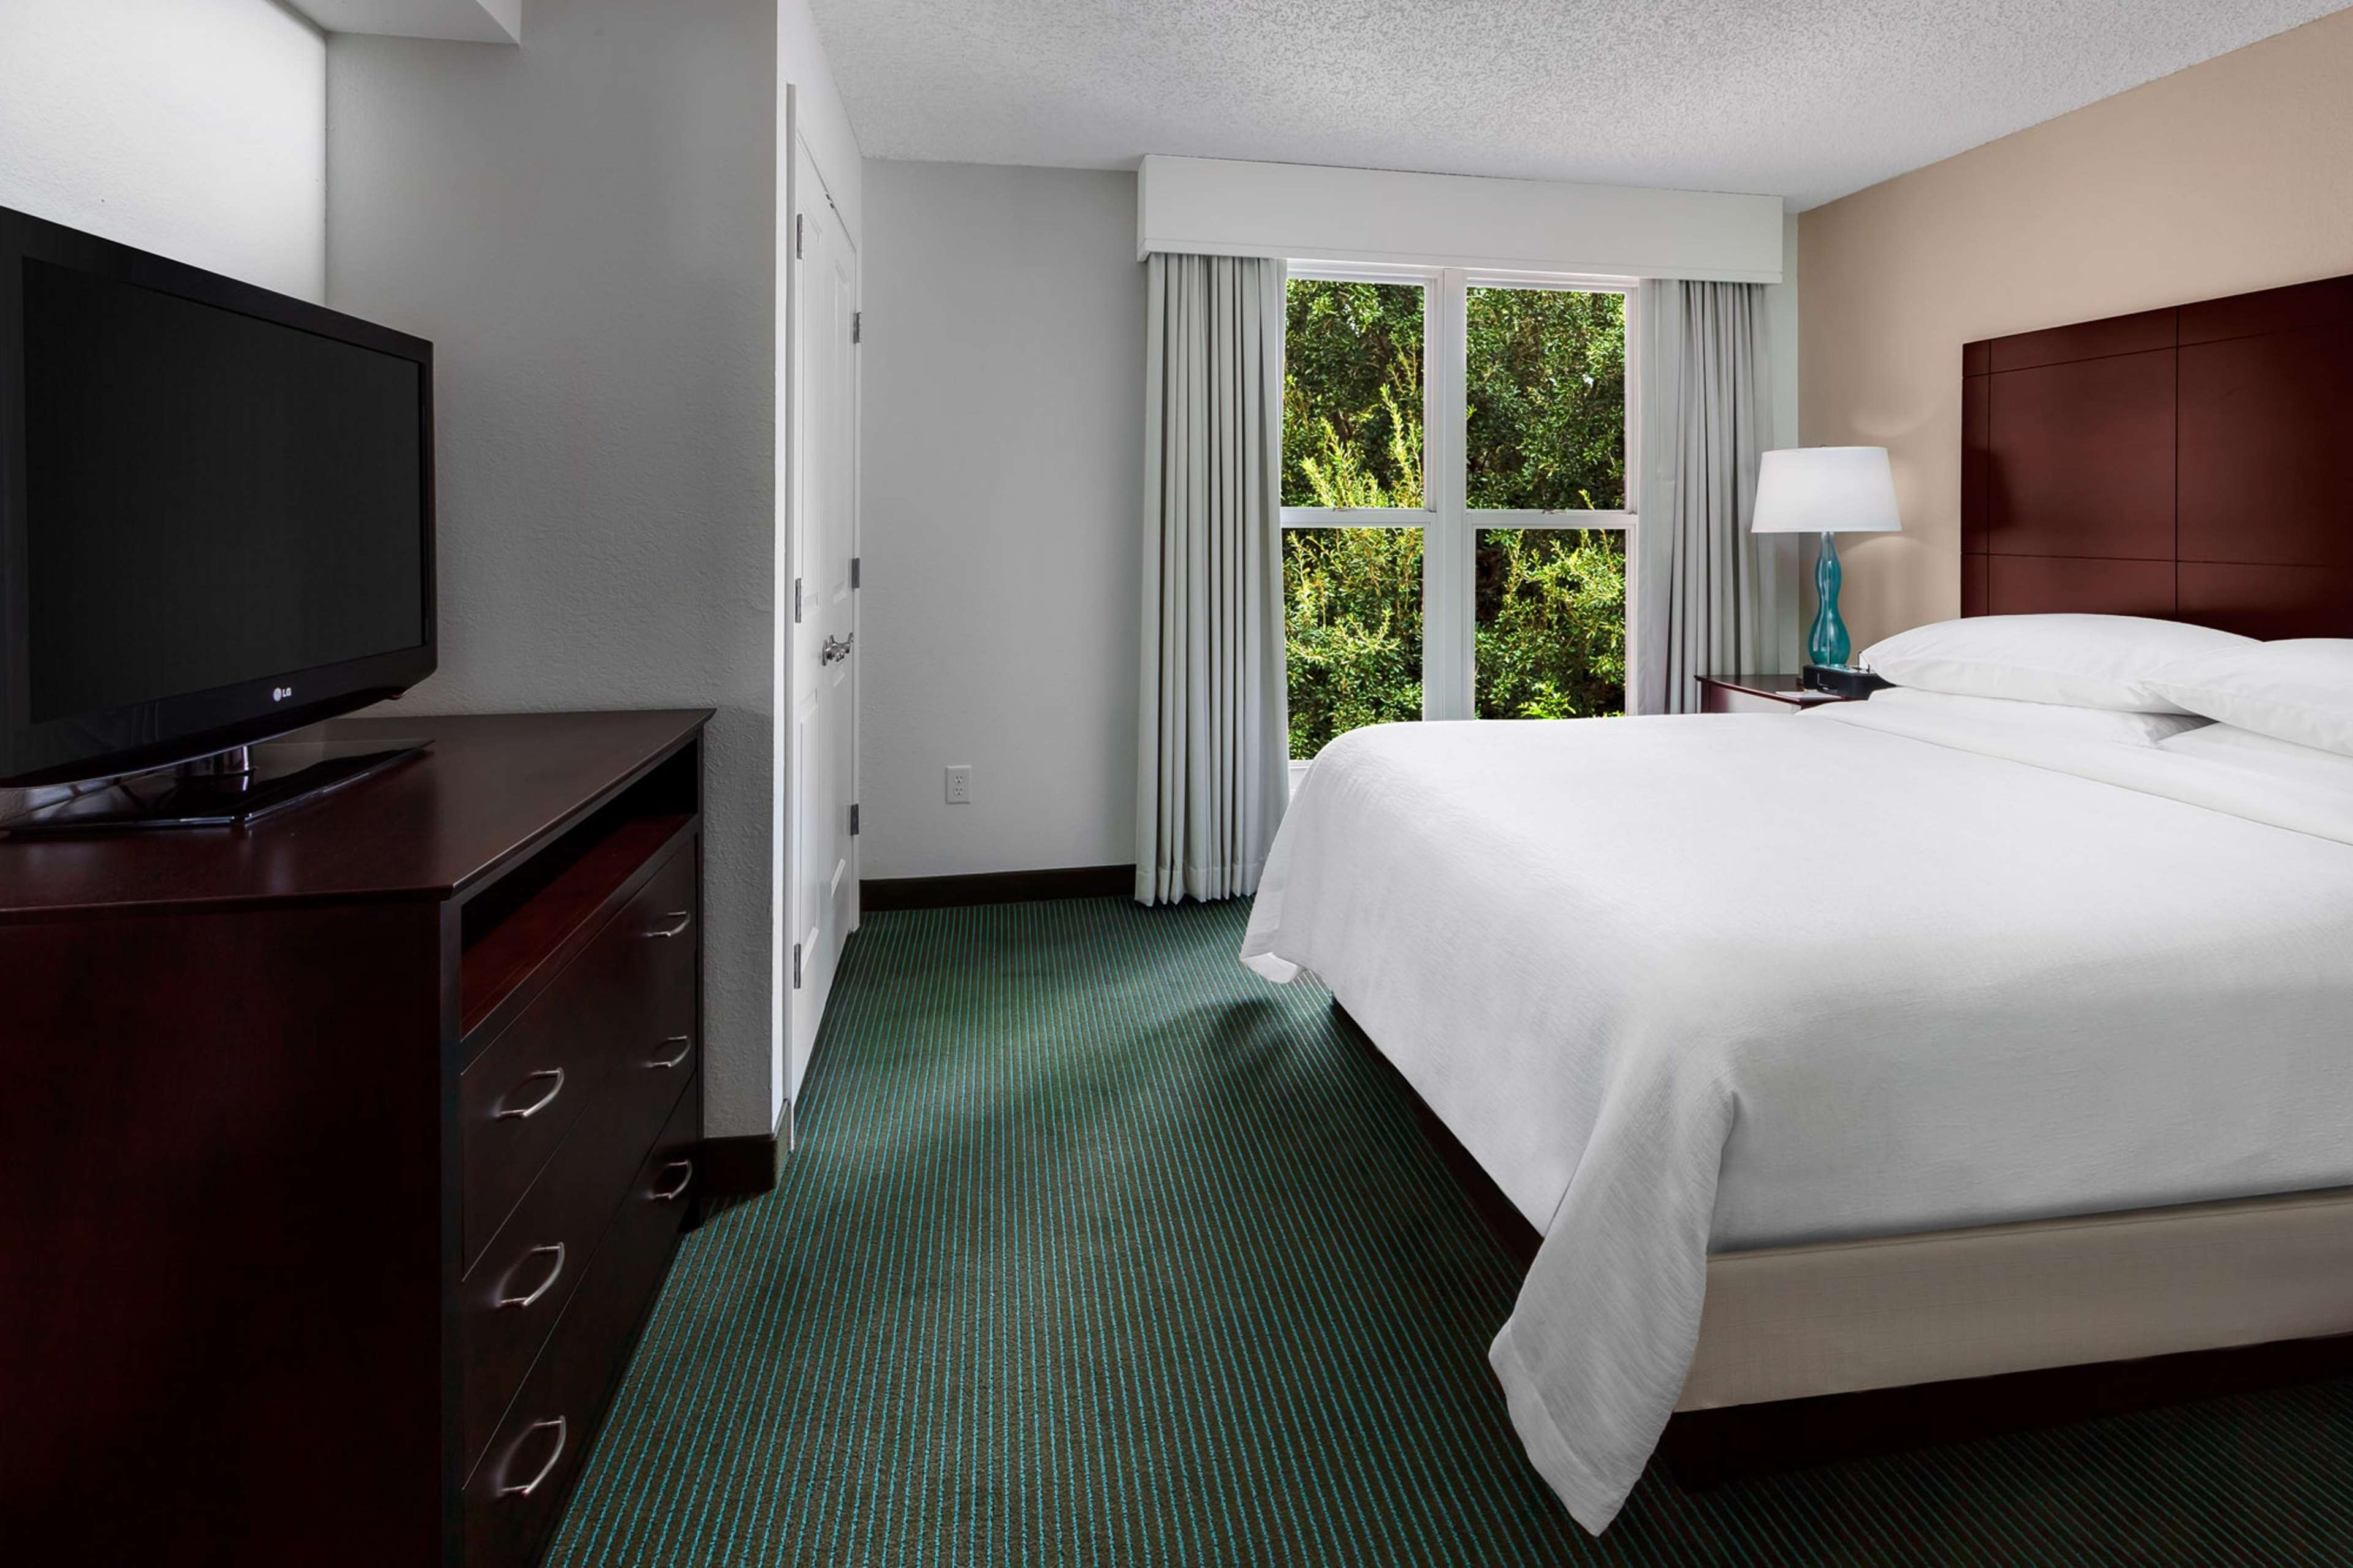 Embassy Suites by Hilton Orlando Lake Buena Vista Resort image 22